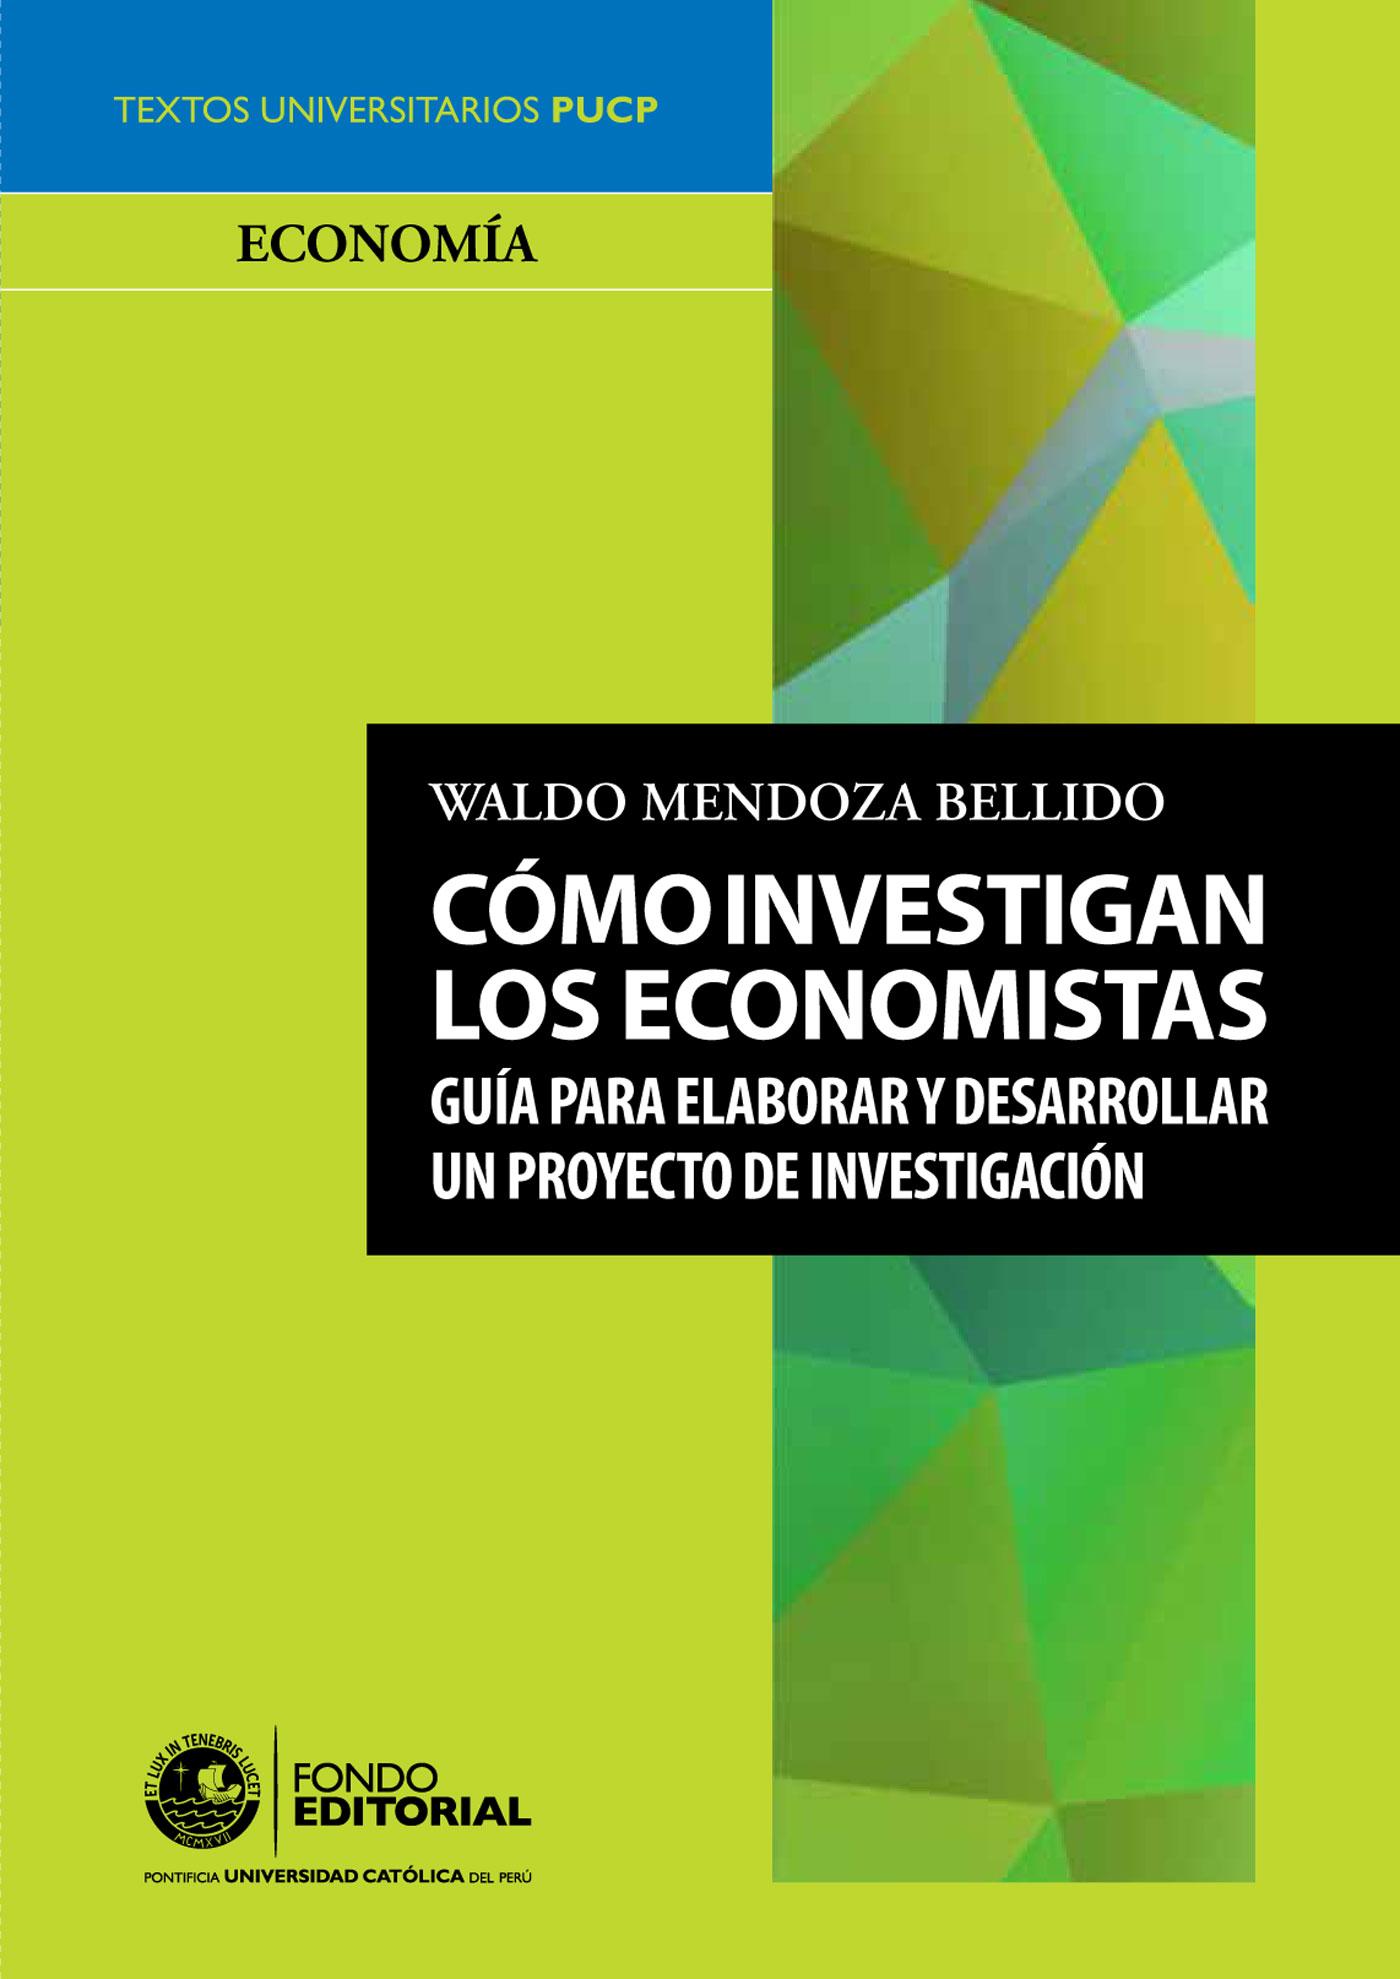 Waldo Mendoza Cómo investigan los economistas mendoza mendoza рюкзак для подростков этника черно оранжевый